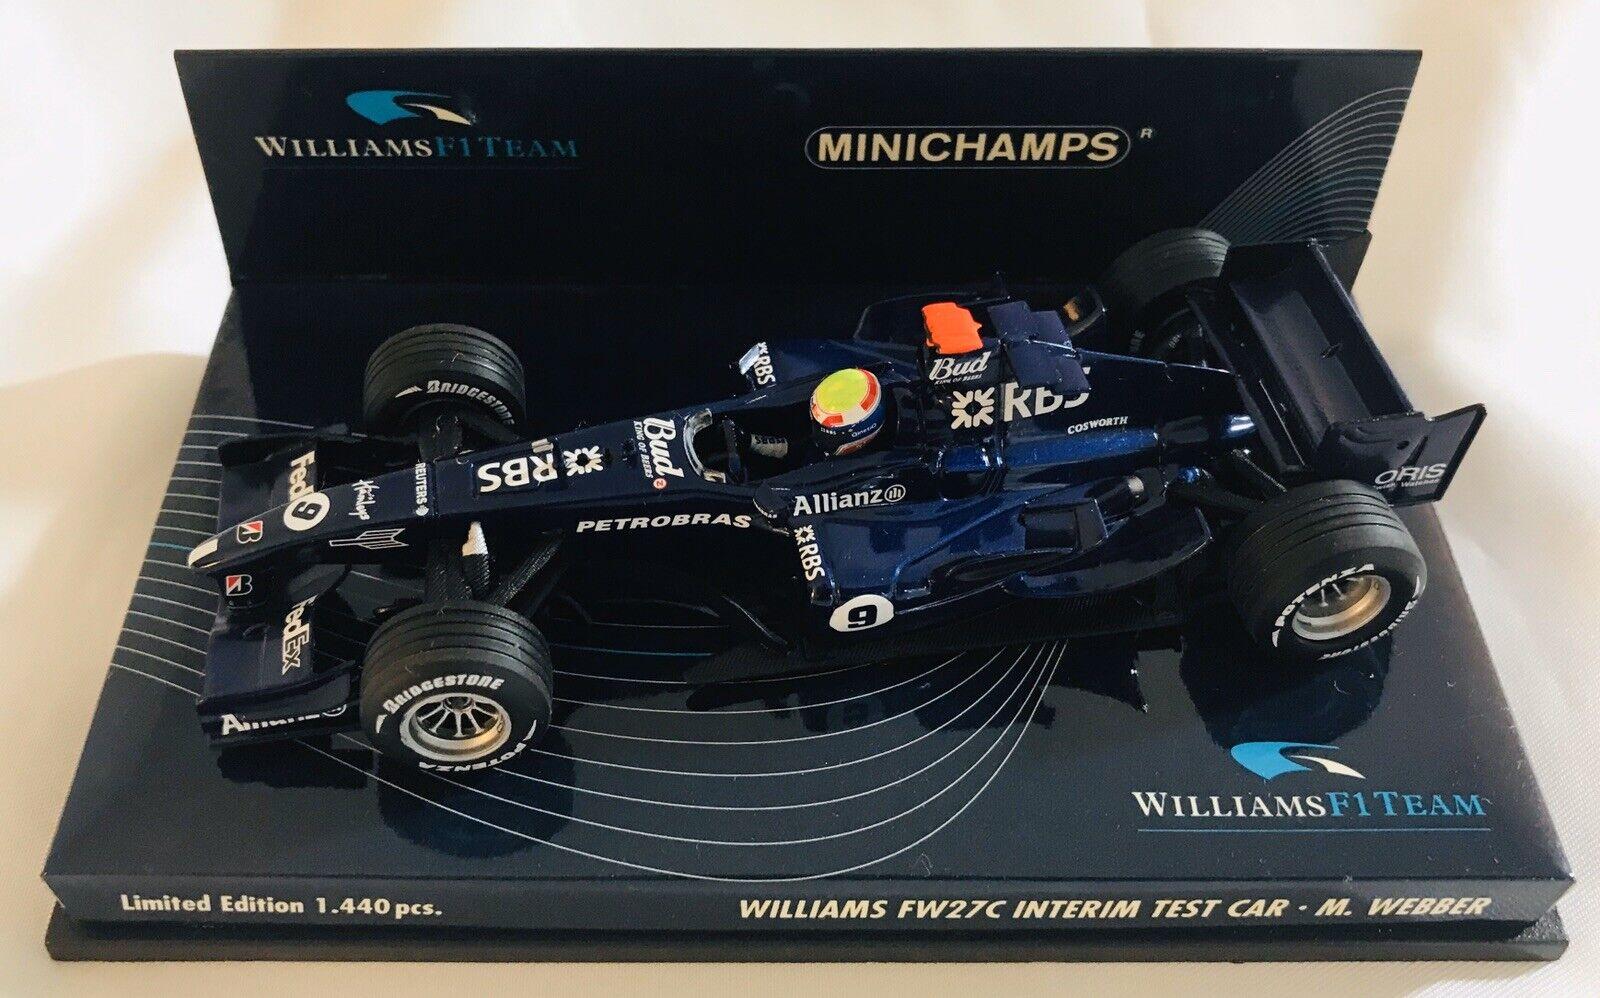 Minichamps F1 1 43 Williams FW27C Interim Test Car 2005 - m.Webber 400050109